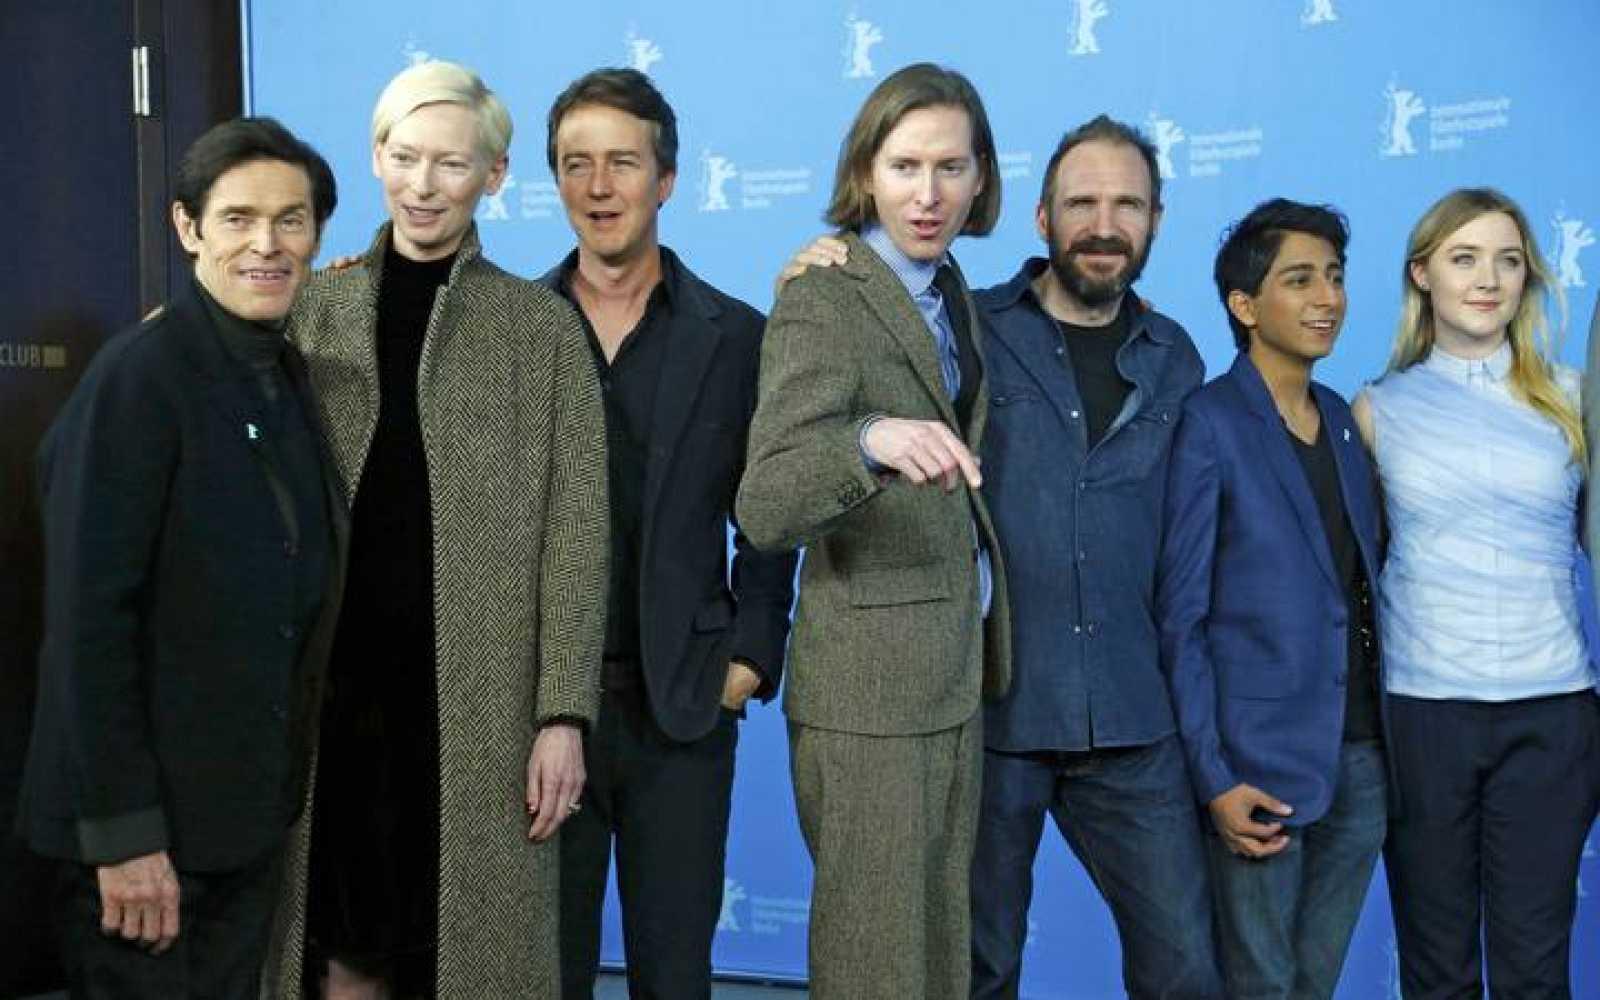 "Actors Dafoe, Swinton, Norton, director Anderson, Fiennes, Revolori and Ronan pose to promote the movie ""The Grand Budapest Hotel"" at the 64th Berlinale International Film Festival in Berlin"